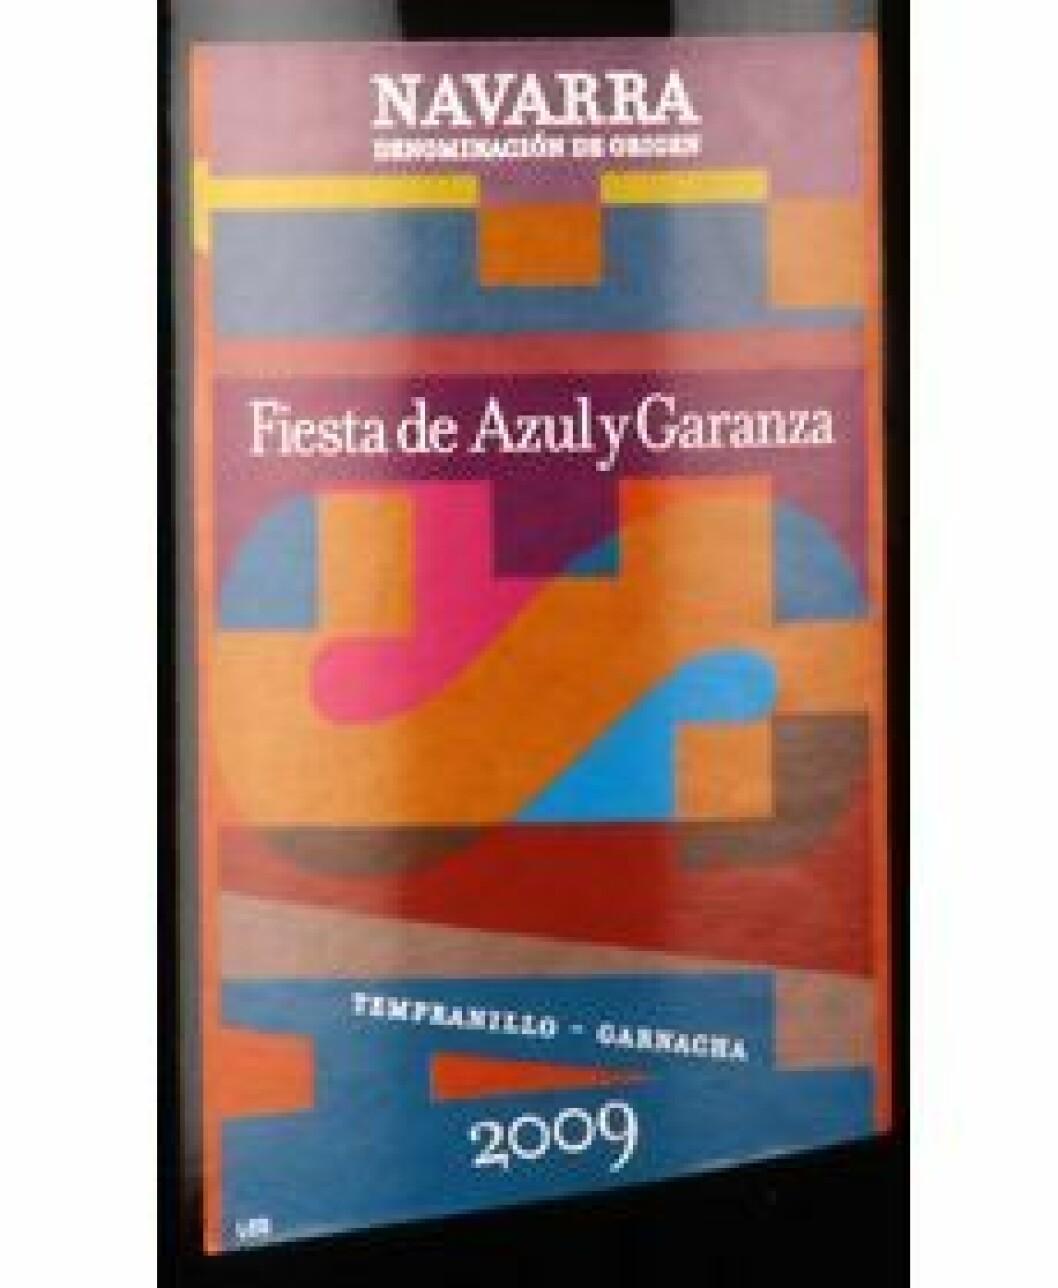 Fiesta de Azuly Garanza1